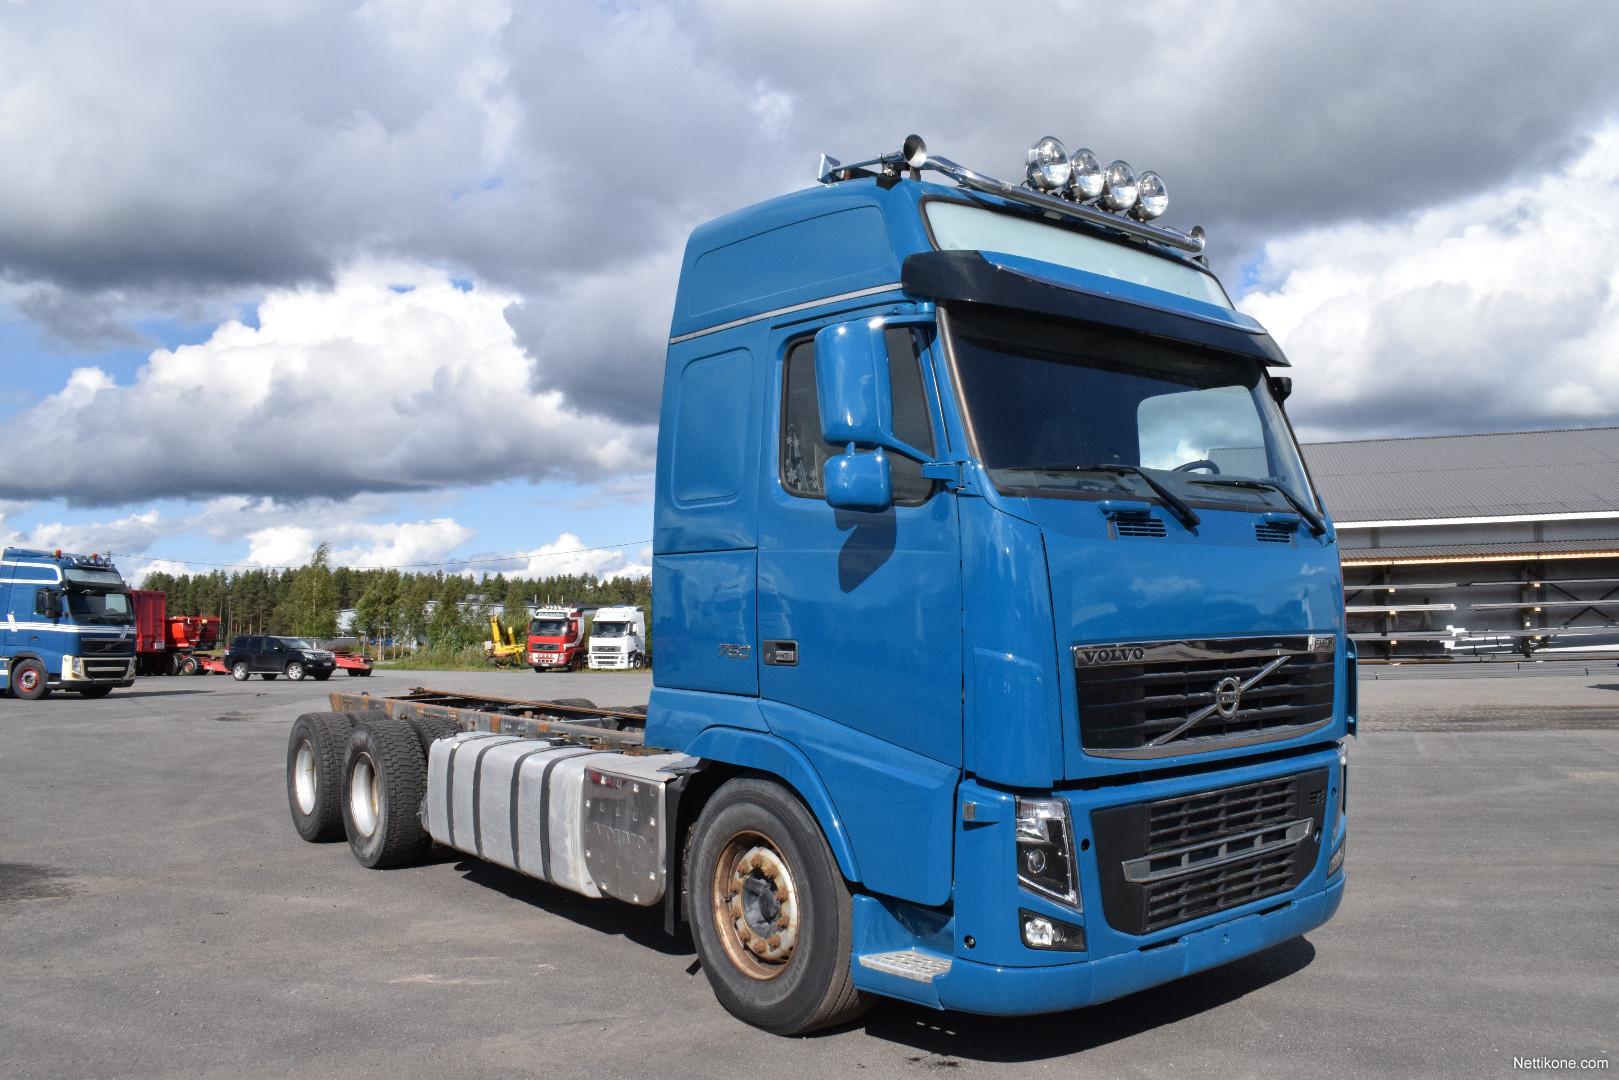 Volvo Fh16 750 6x4 Kuorma Autot 2012 Nettikone